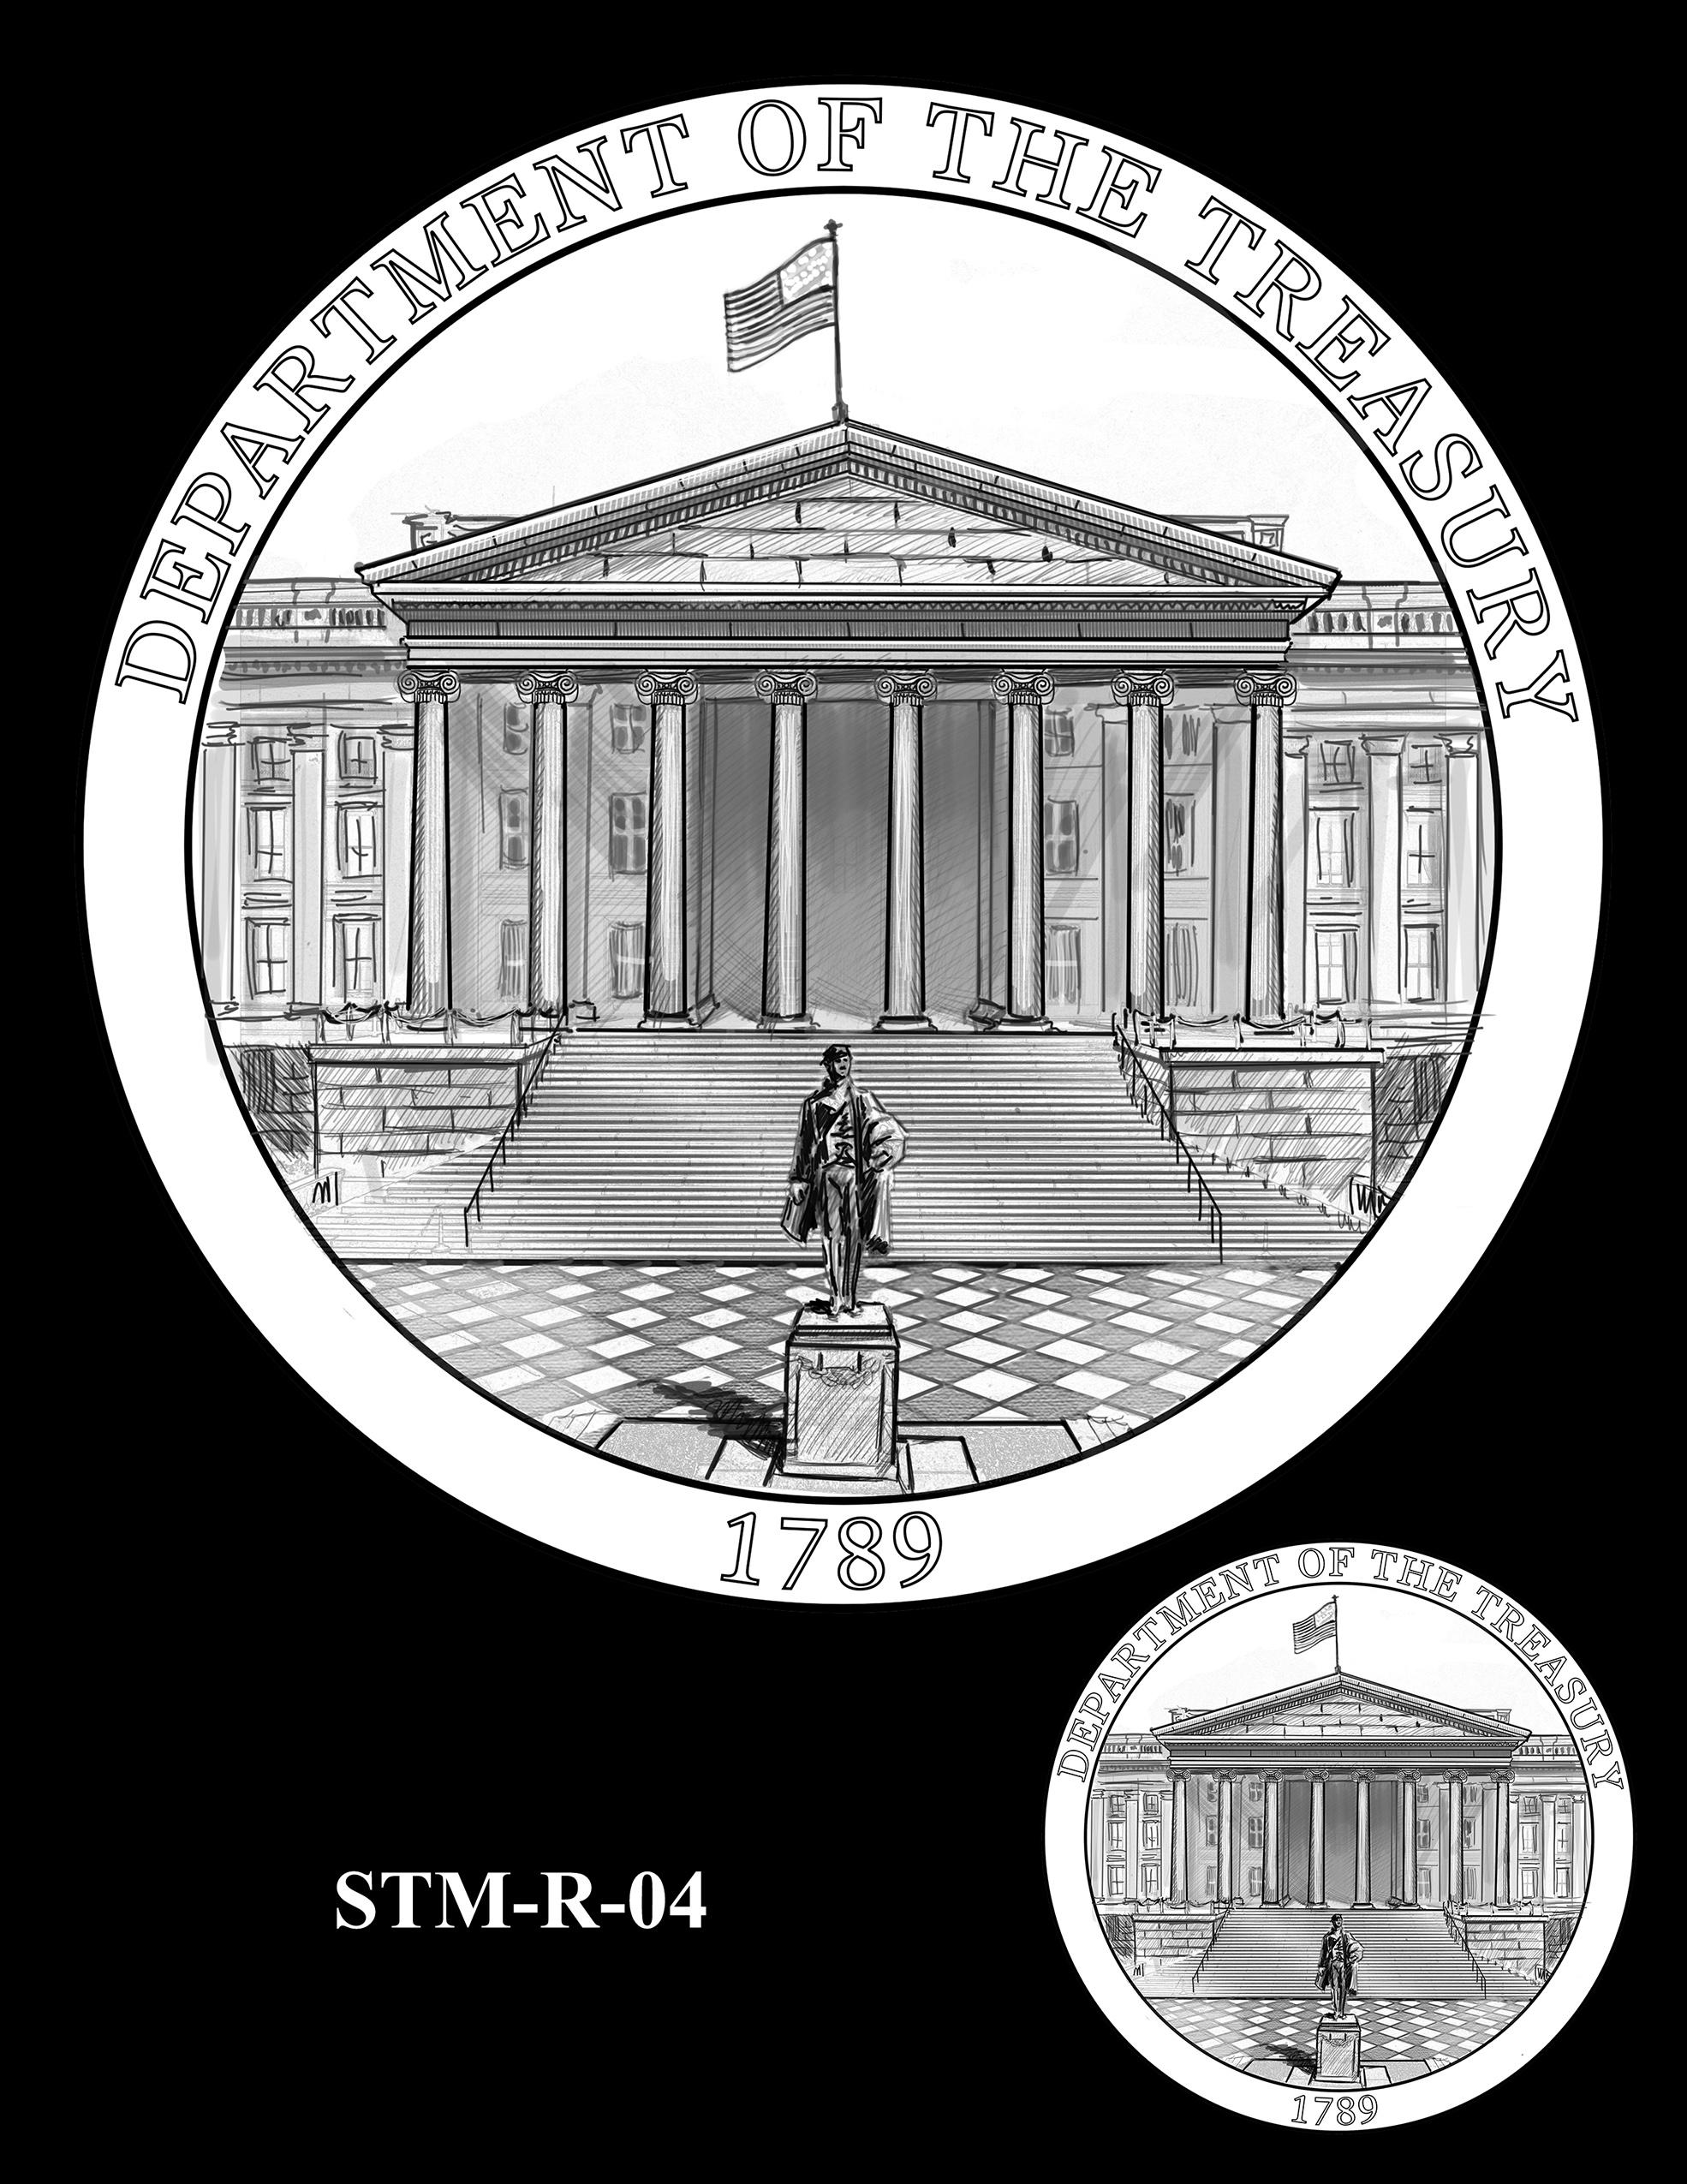 STM-R-04 -- Steven T. Mnuchin Secretary of the Treasury Medal